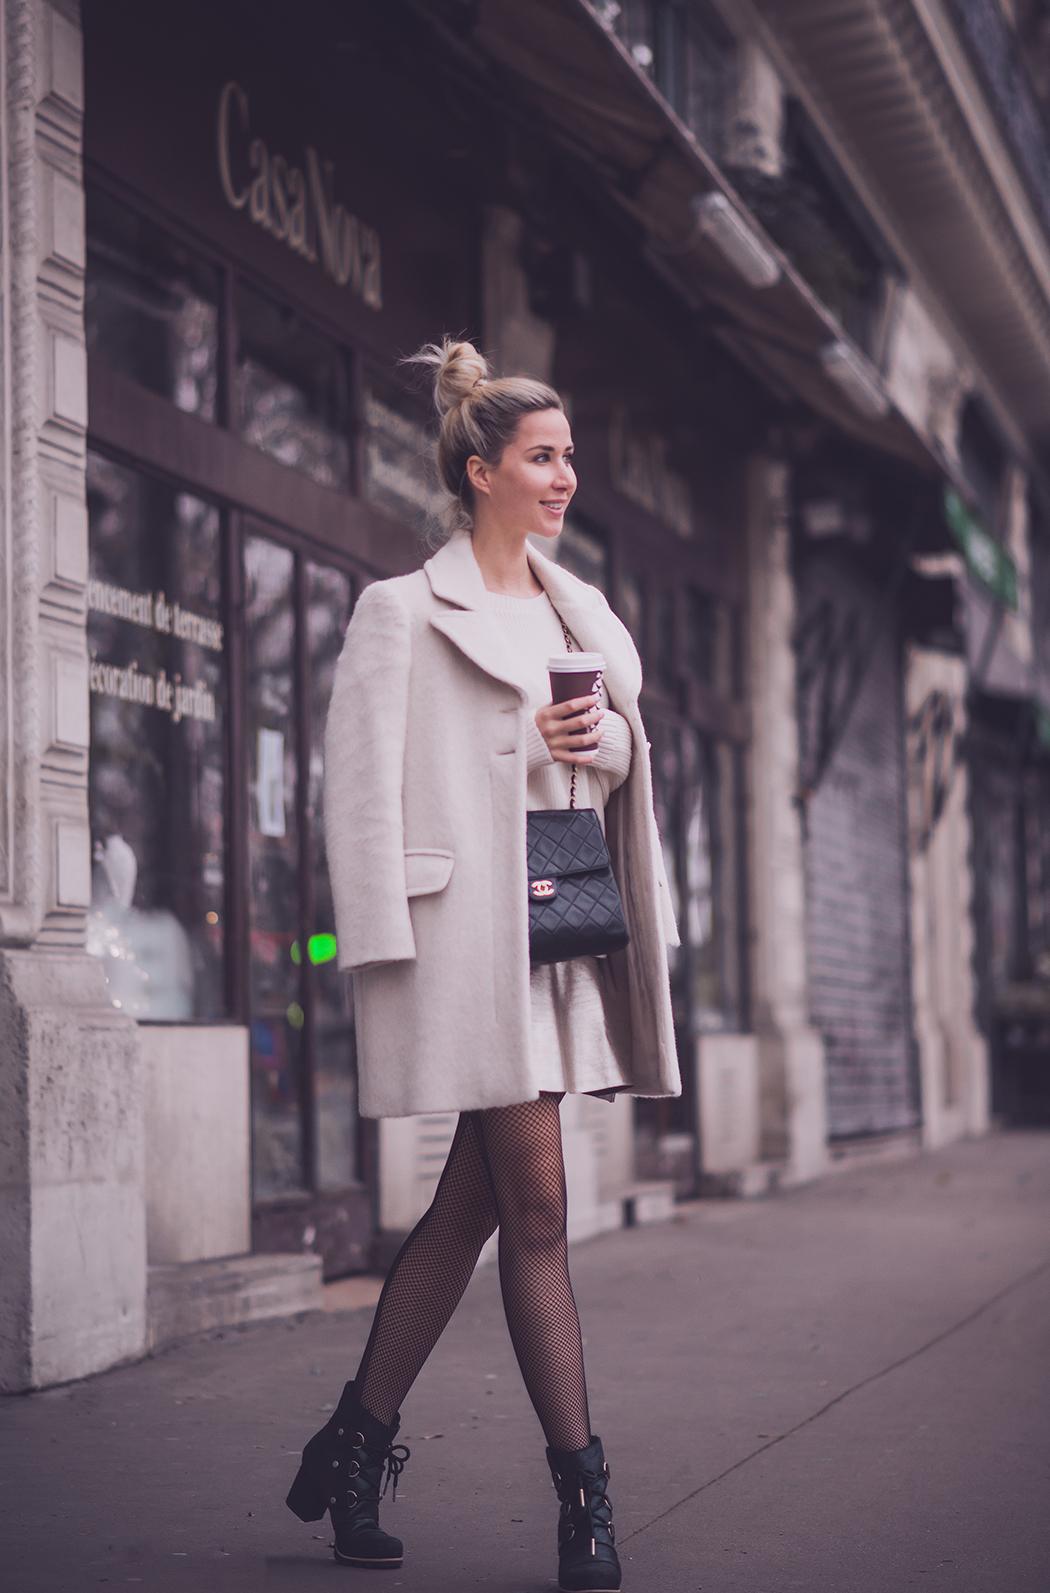 fashionblog-fashionblogger-fashion-blog-blogger-paris-muenchen-lindarella-chanel-vintage-bag-3-web